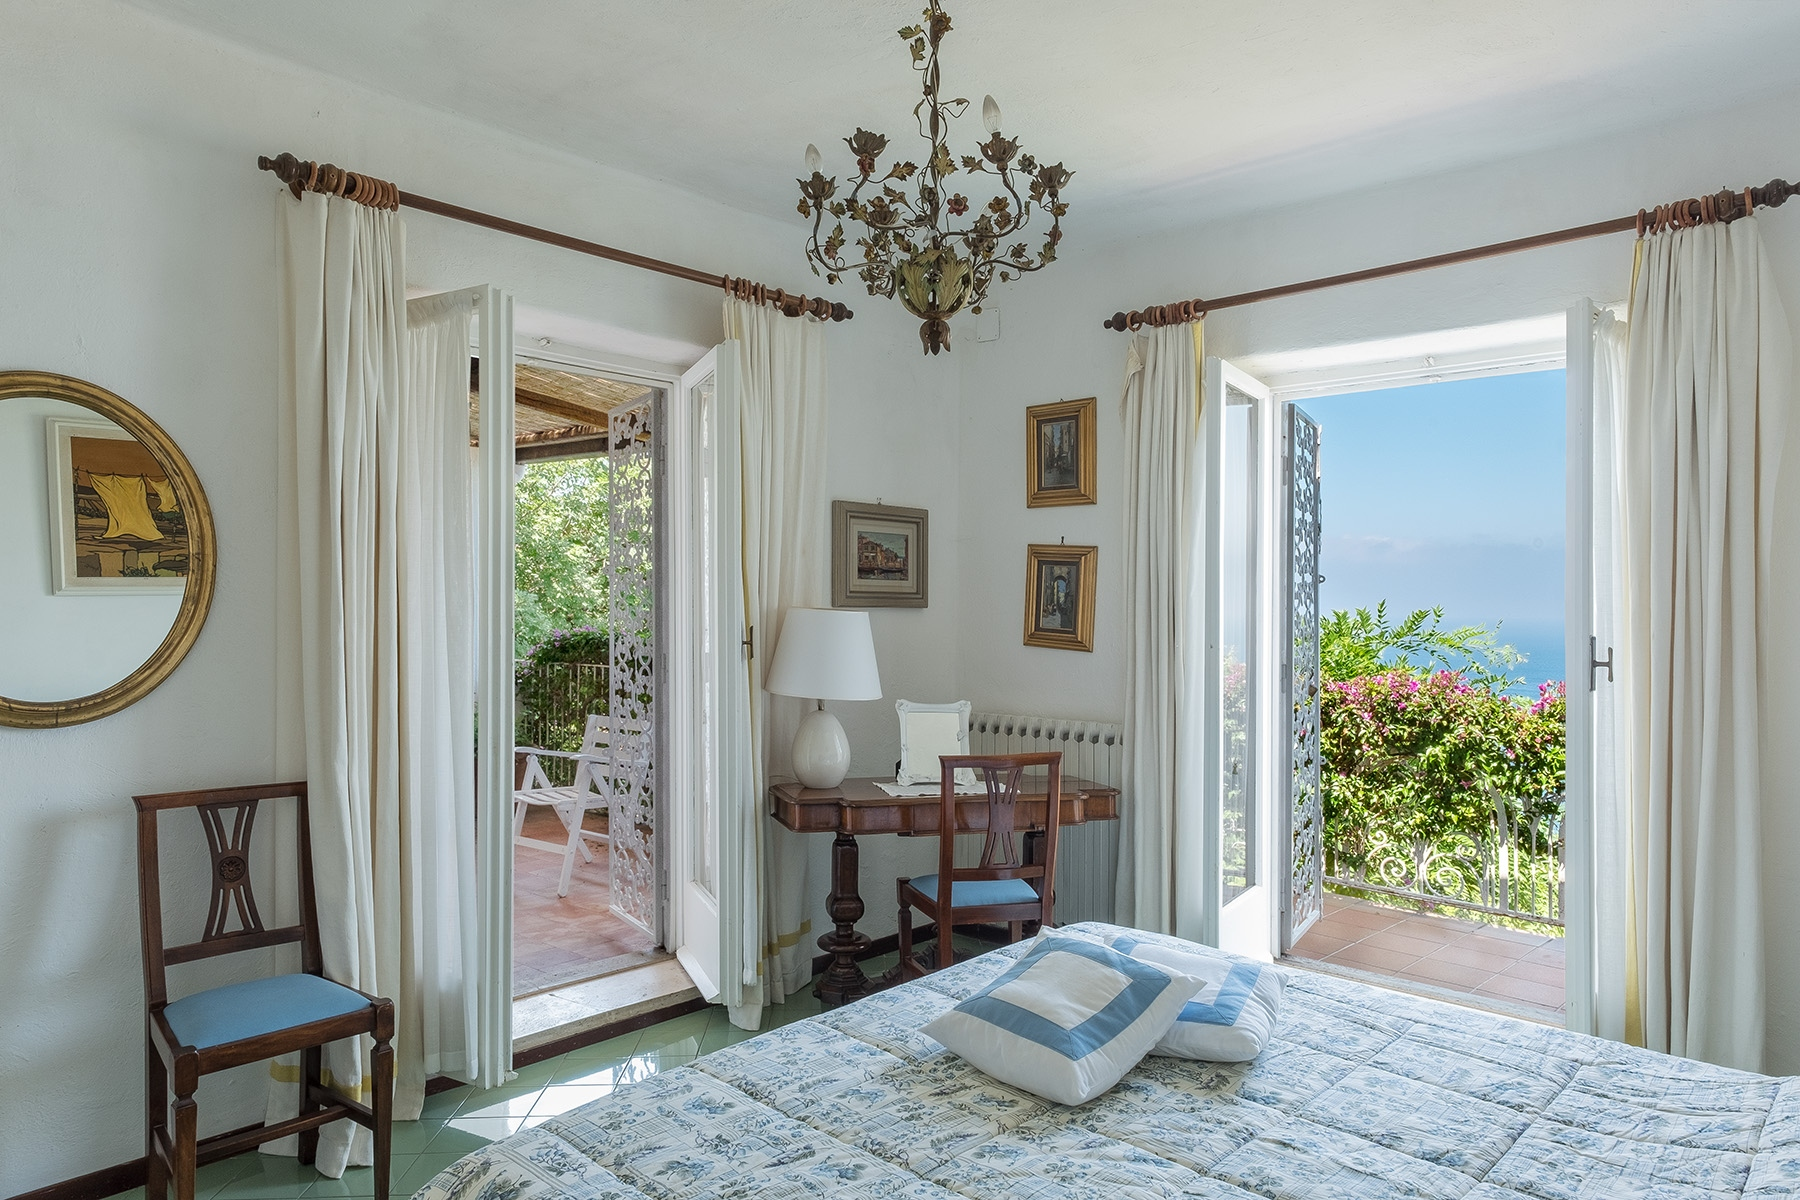 Villa in Vendita a Ischia: 5 locali, 206 mq - Foto 11